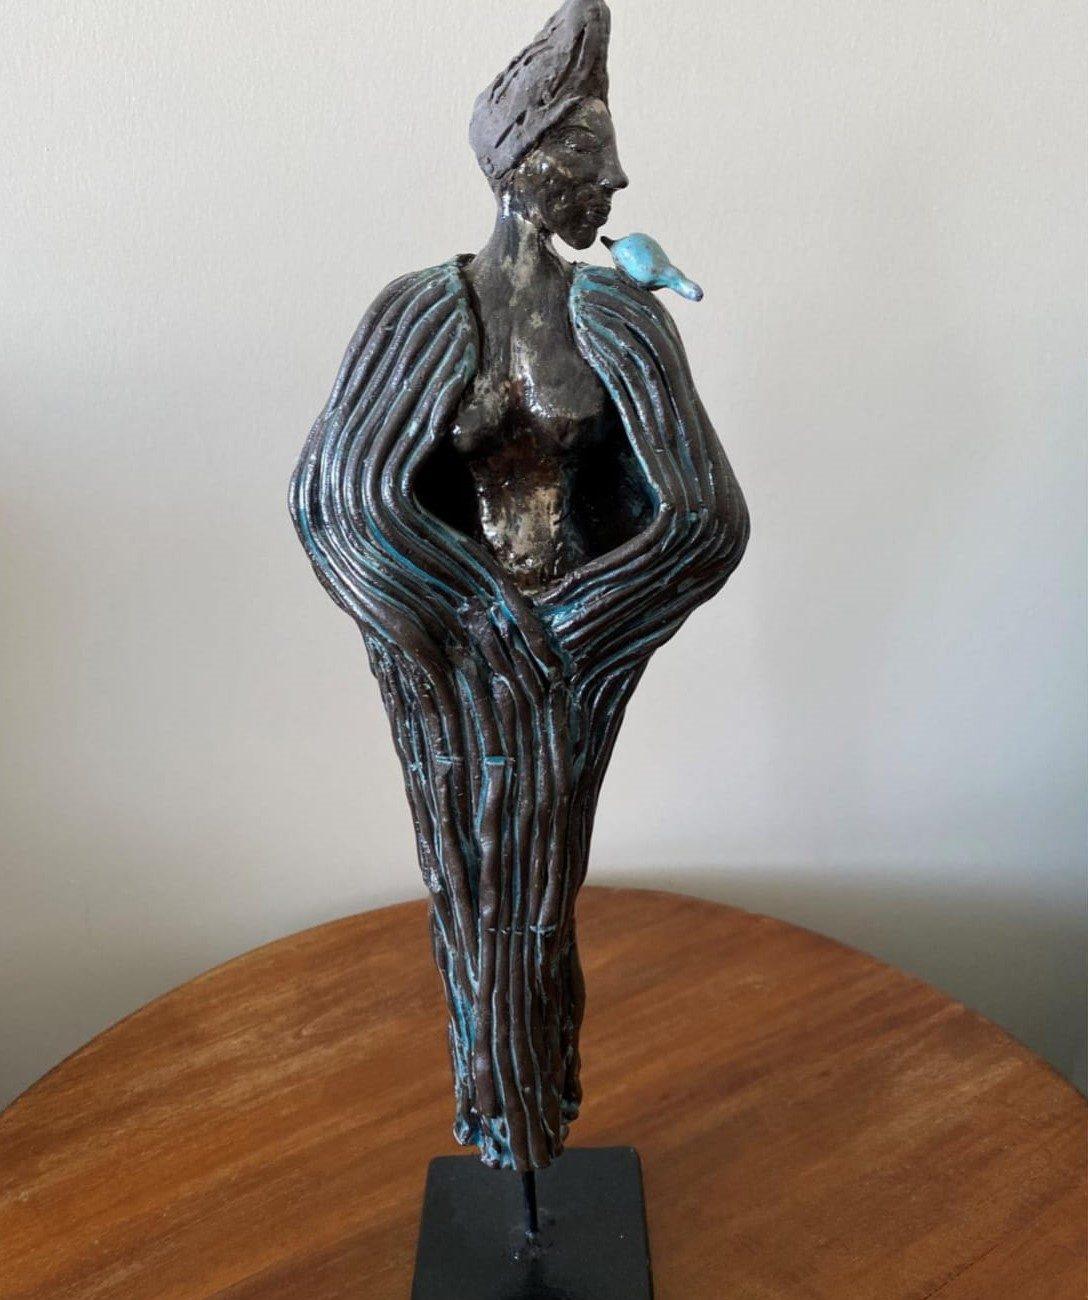 Özgür Kadın Teknik : Siyah Çamur Heykel  Ölçü : 50 cm Fiyat : 2000 TL